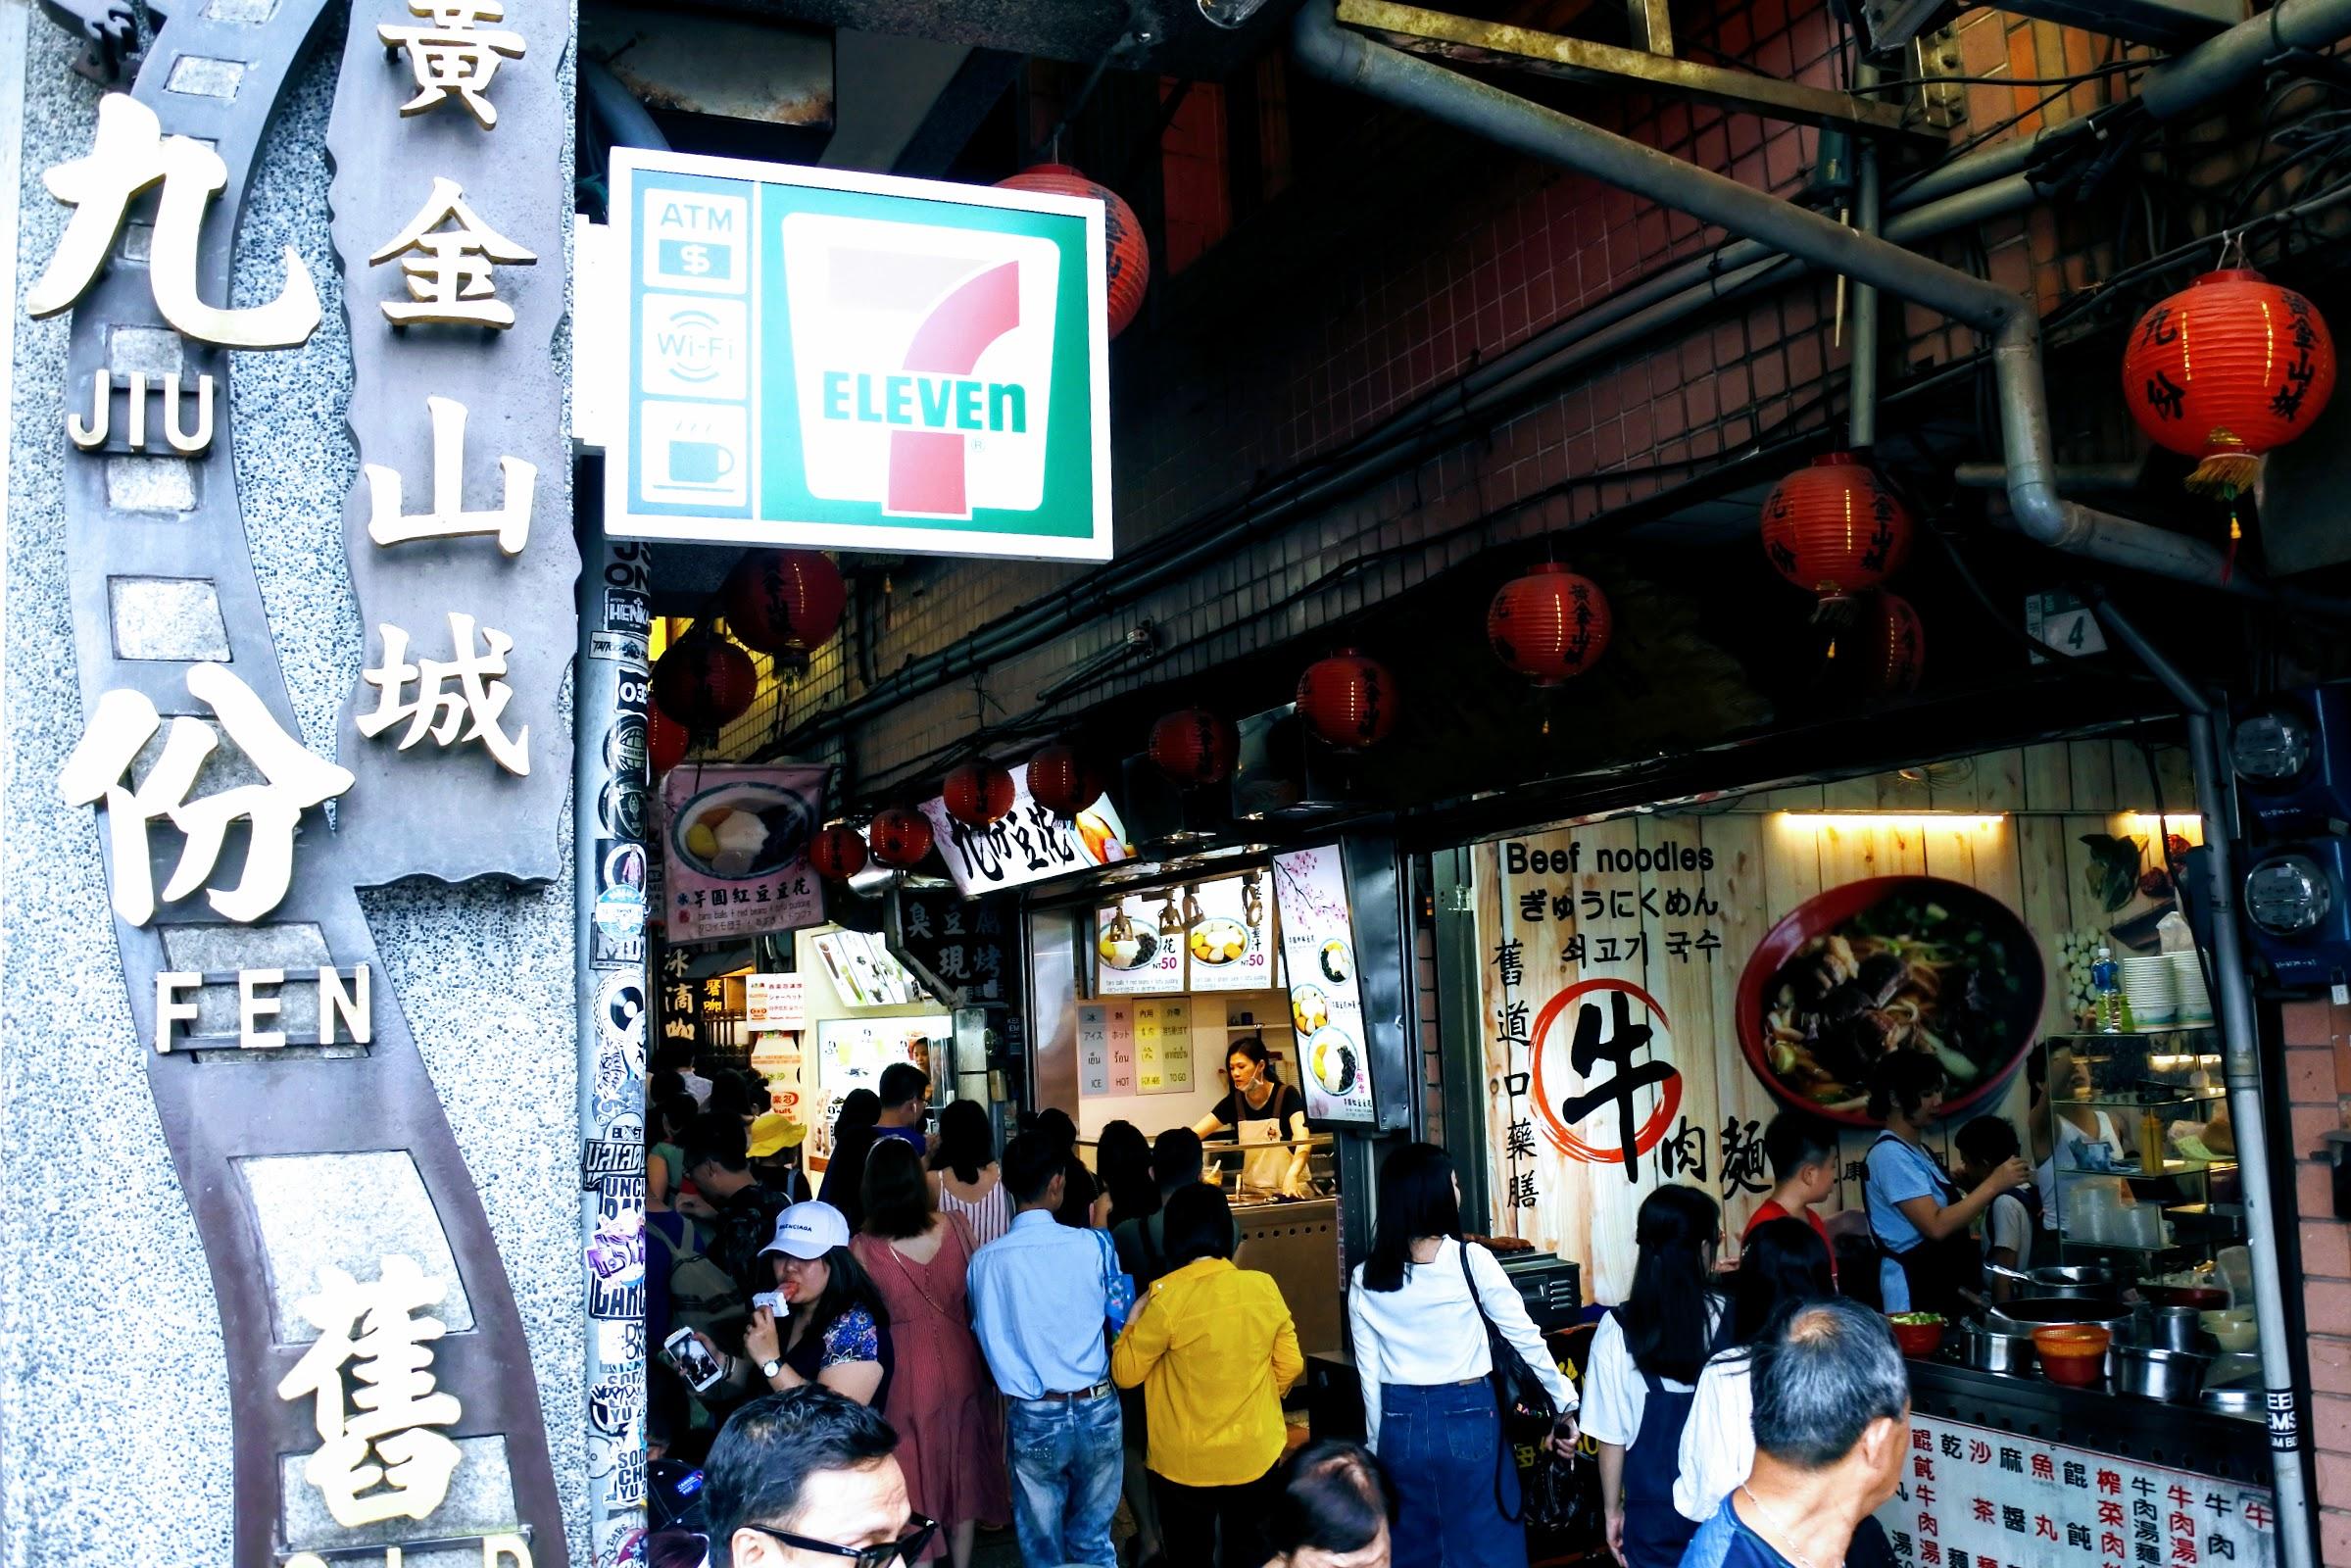 Visiting Jiu Fen Old Street